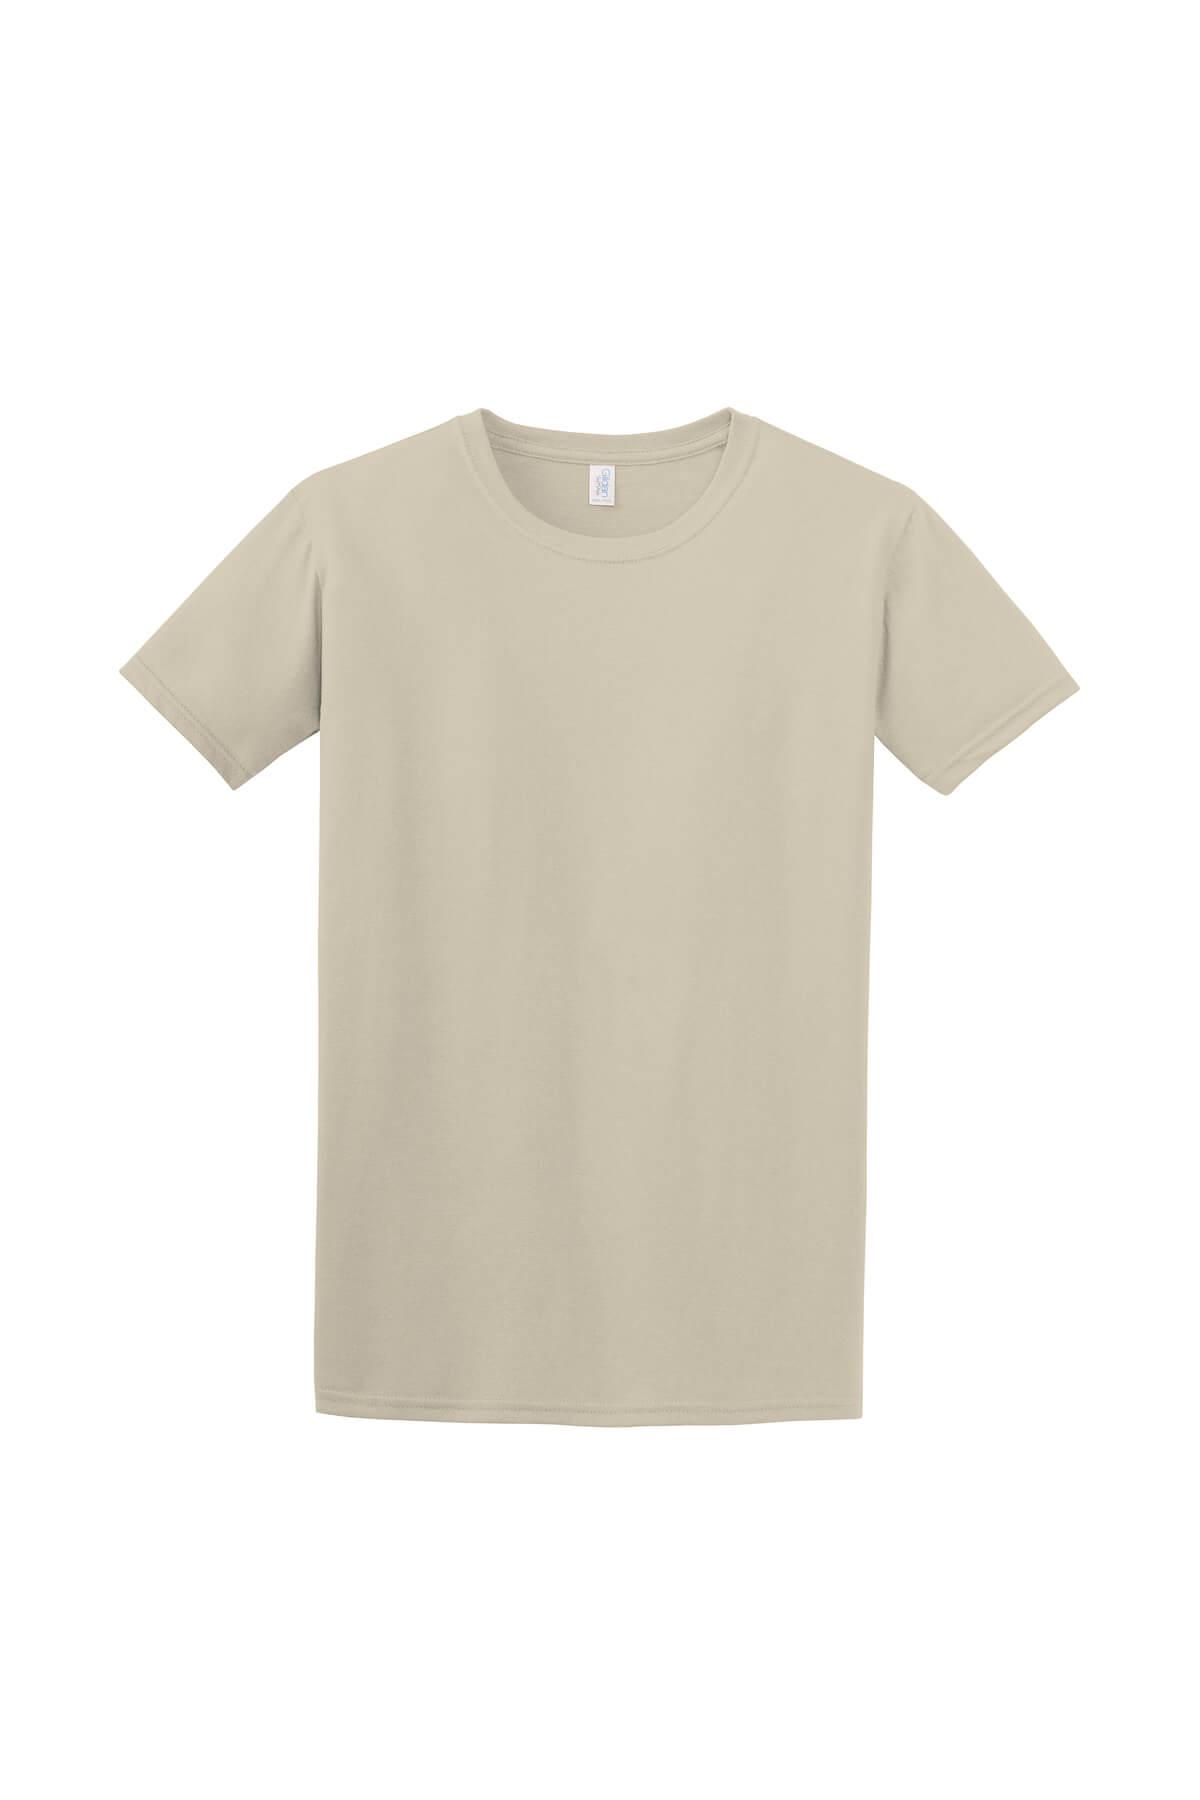 Sand T-Shirt Front